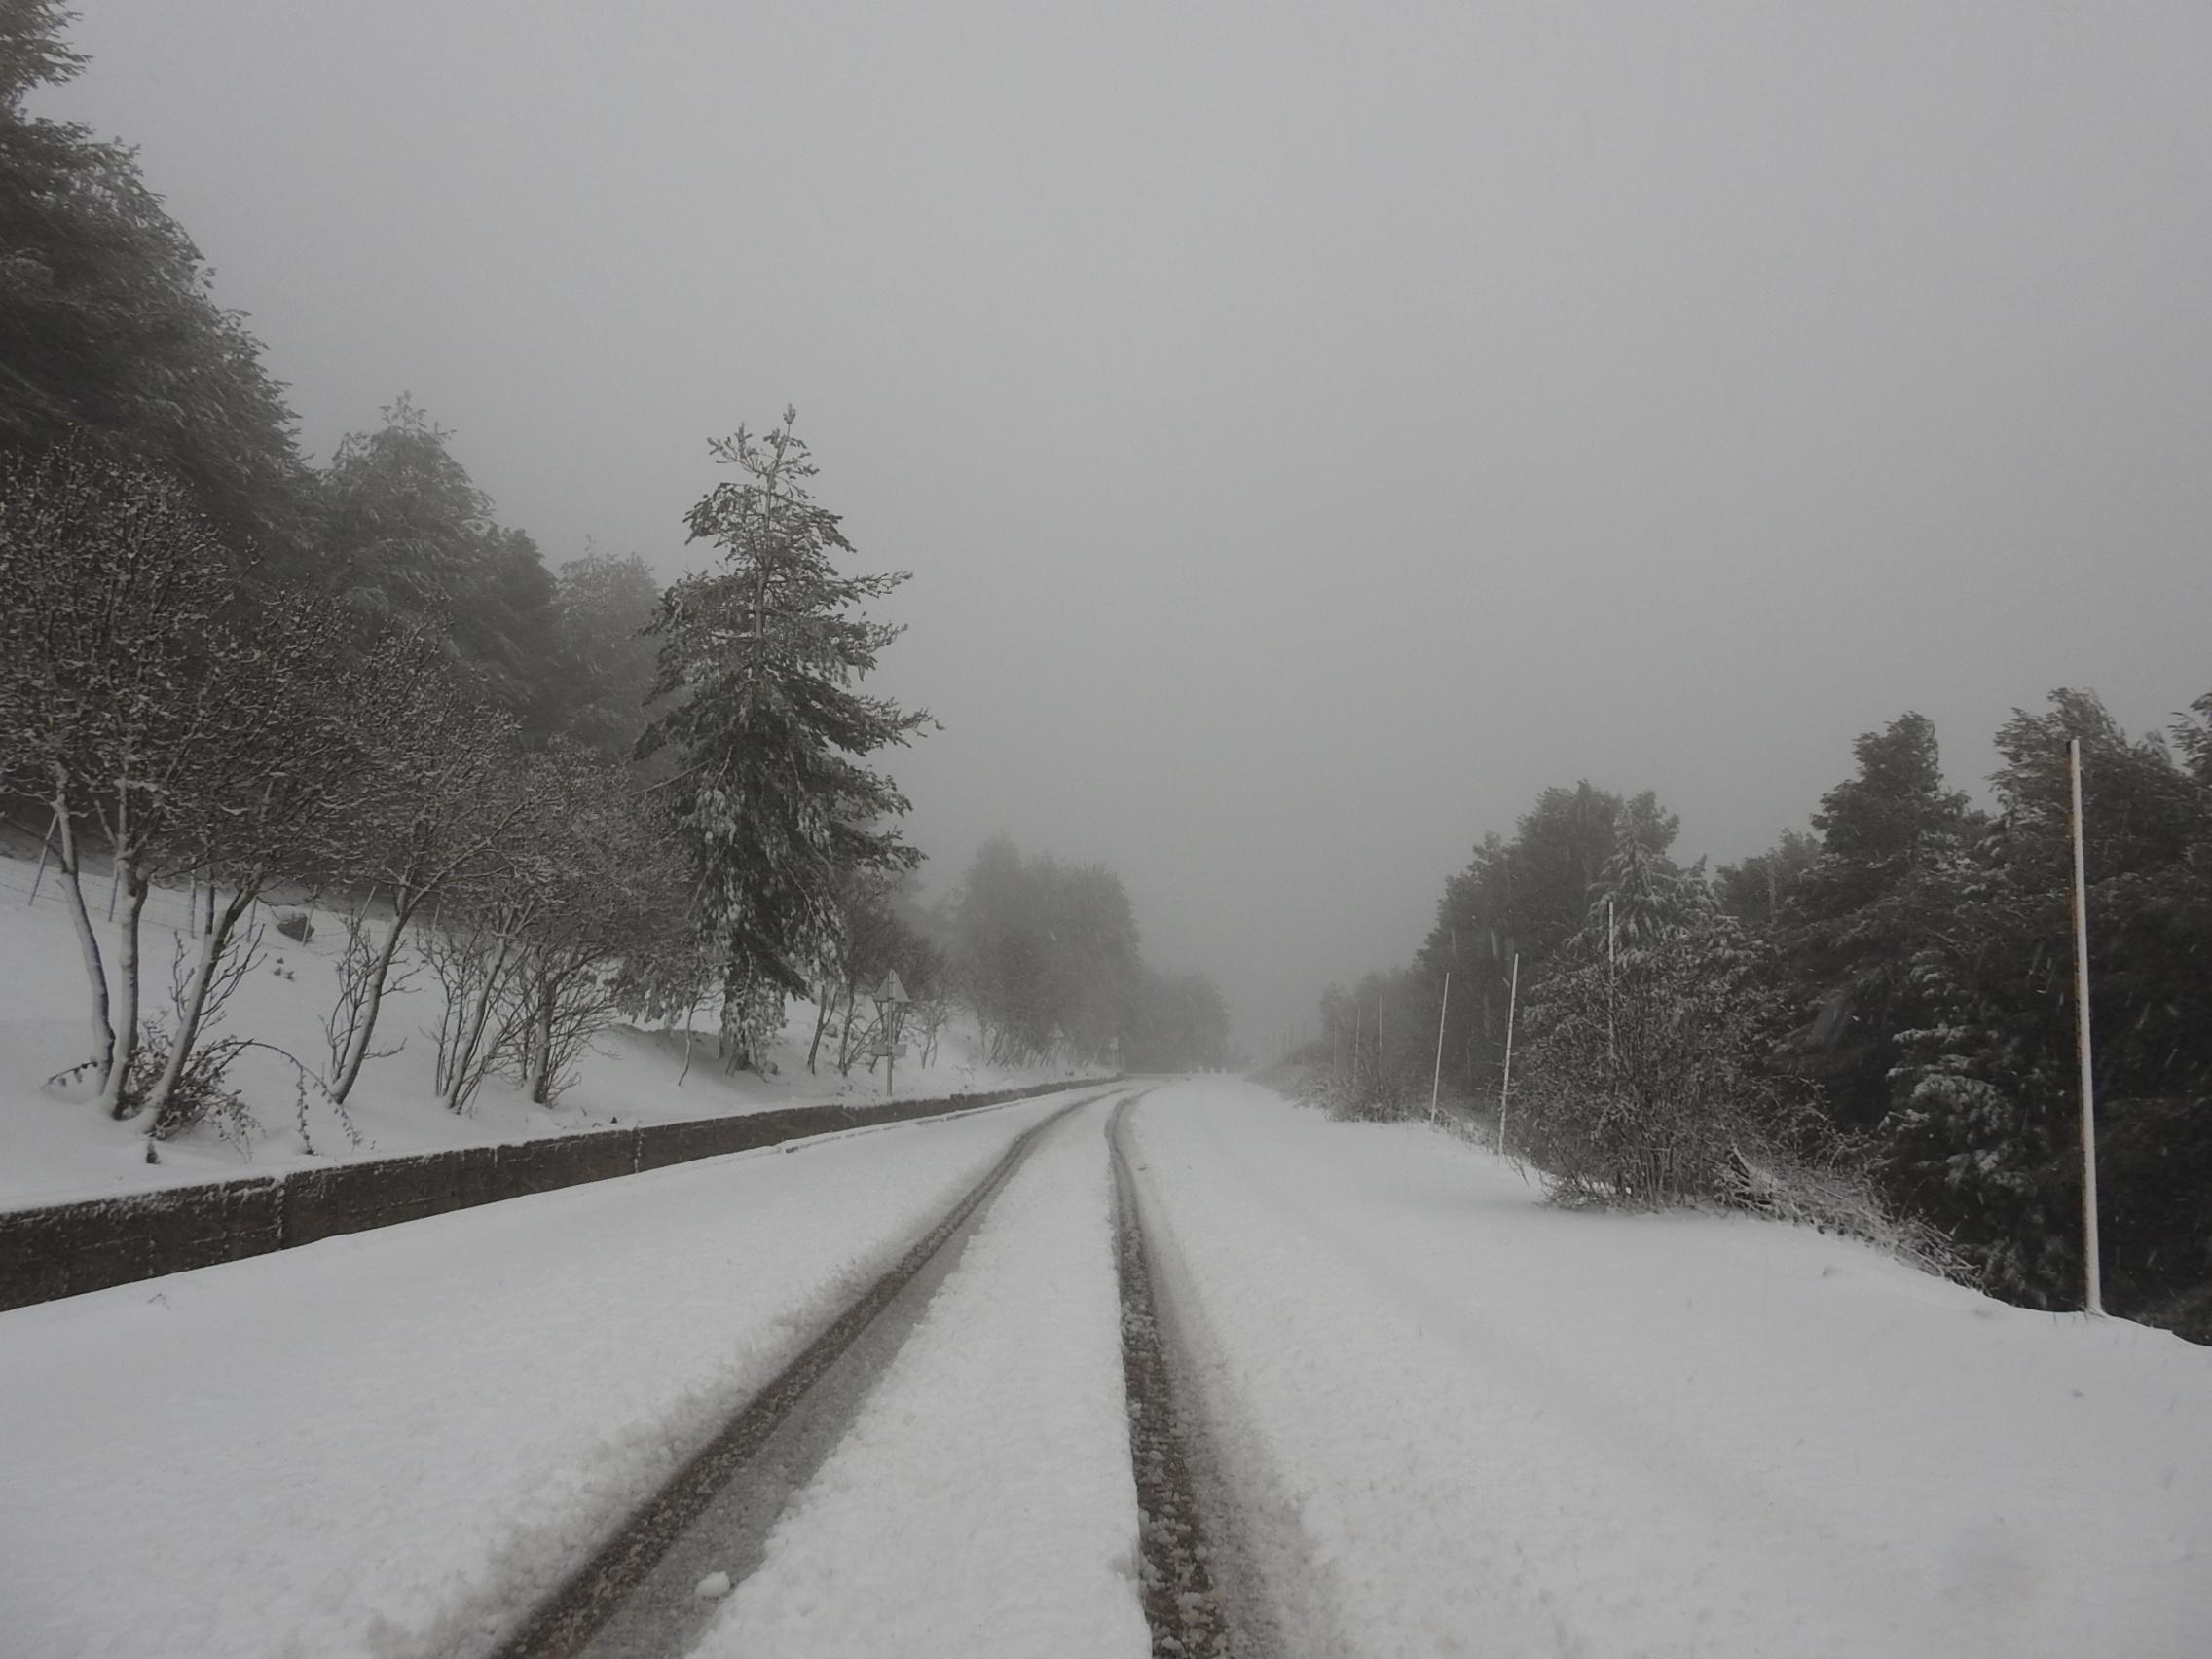 Madonie, finalmente la neve